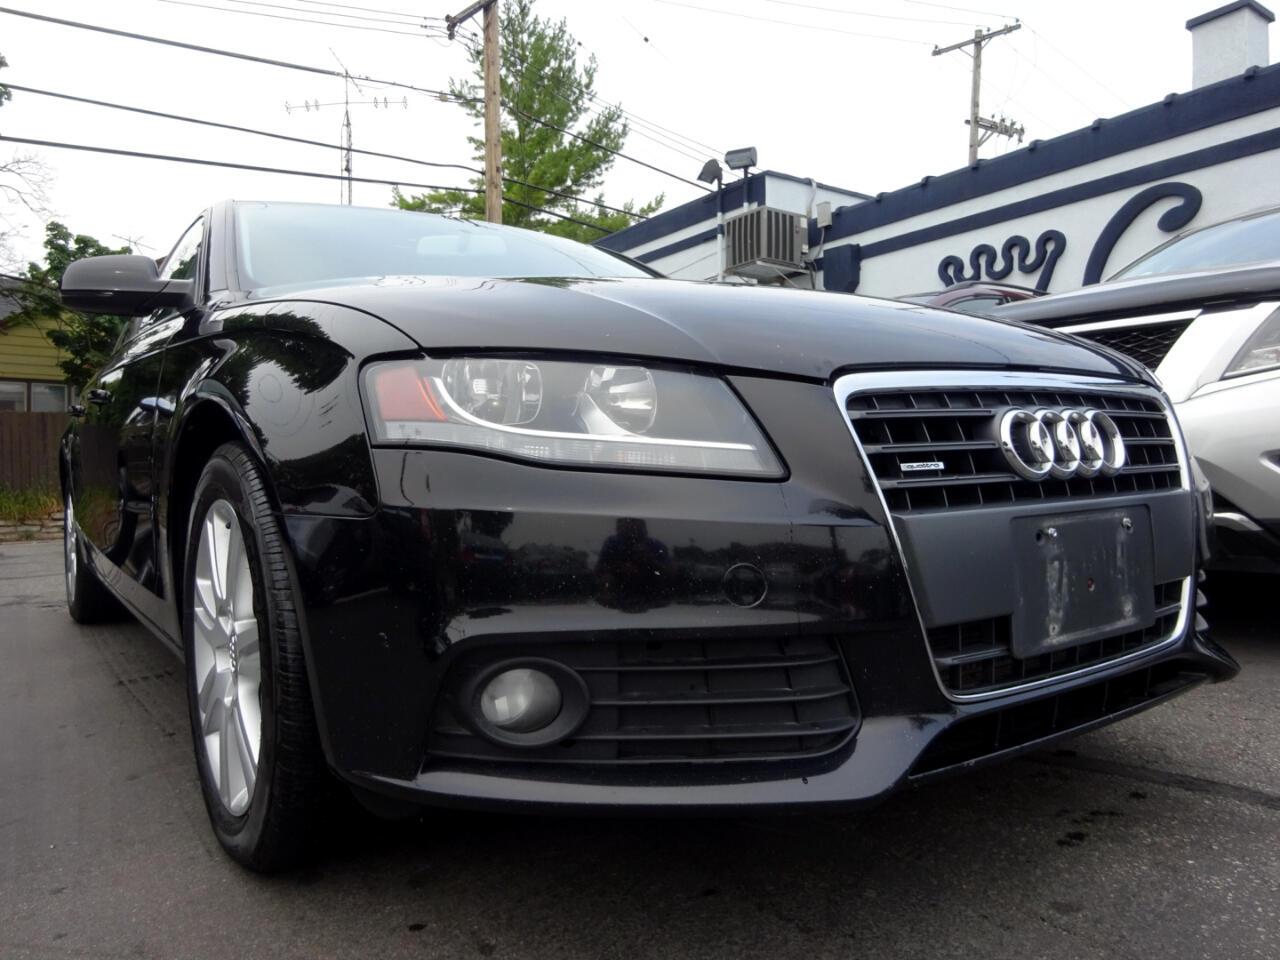 Audi A4 4dr Sdn Auto quattro 2.0T Premium 2011